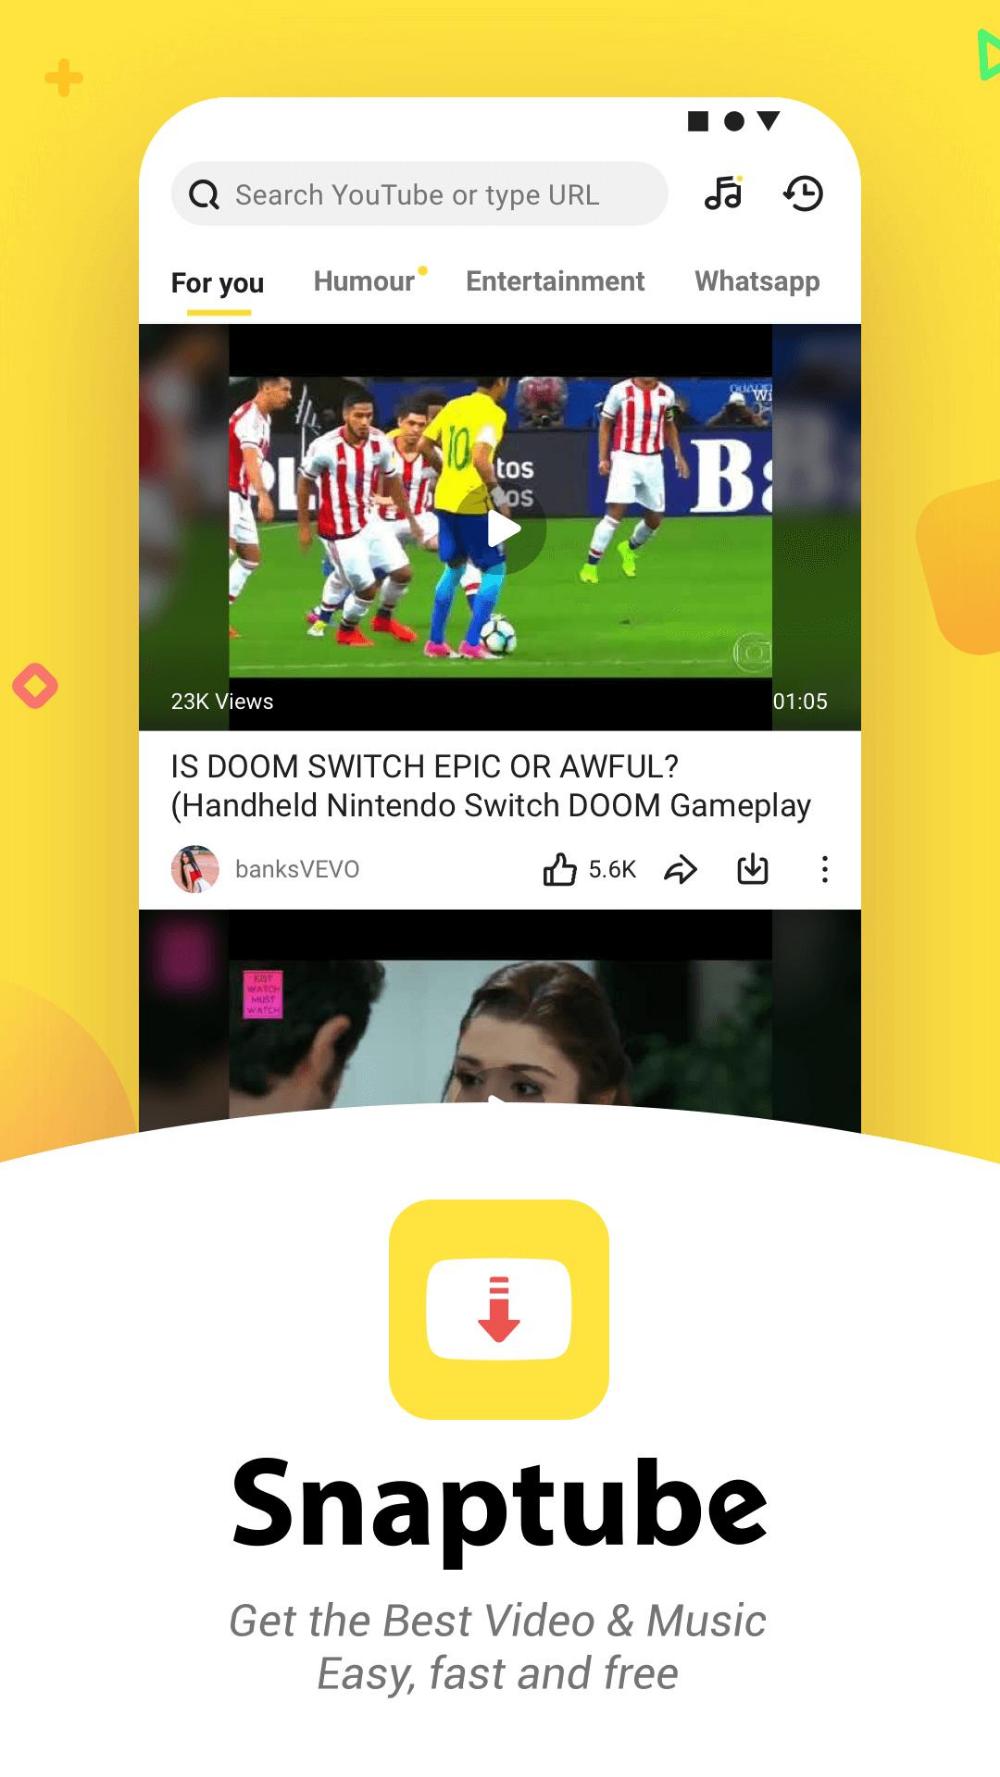 Youtube Downloader And Mp3 Converter Snaptube Android Apps Apk Download Snaptube Youtube Video To Audio Converter Android Apps